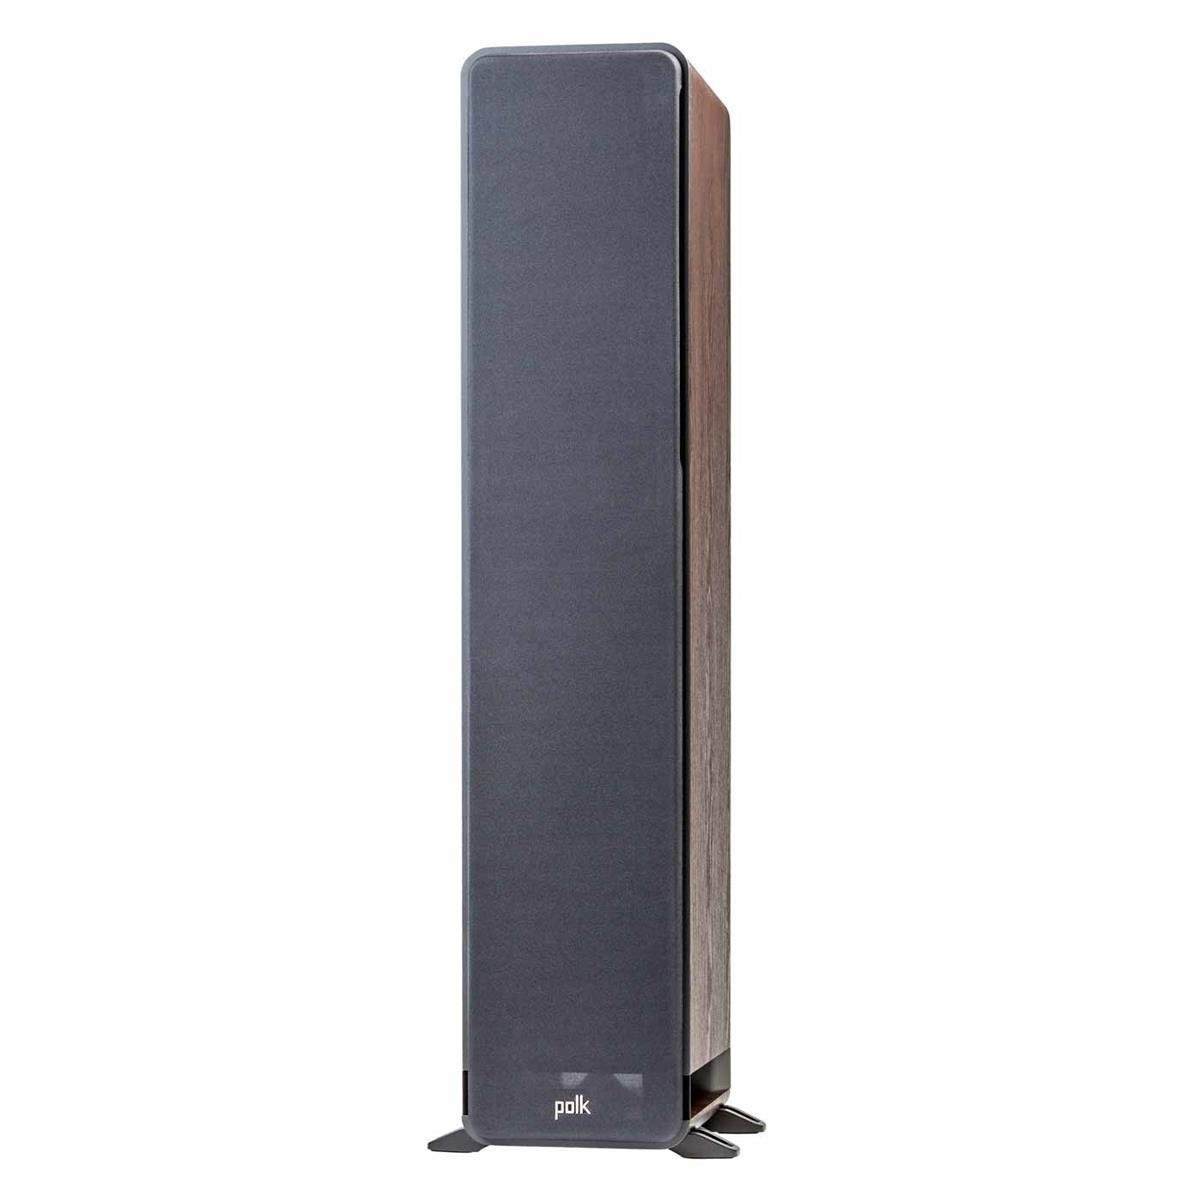 Polk Audio Signature Series S50 American Hi-Fi Home Theater Small Tower Speaker (Classic Brown Walnut)